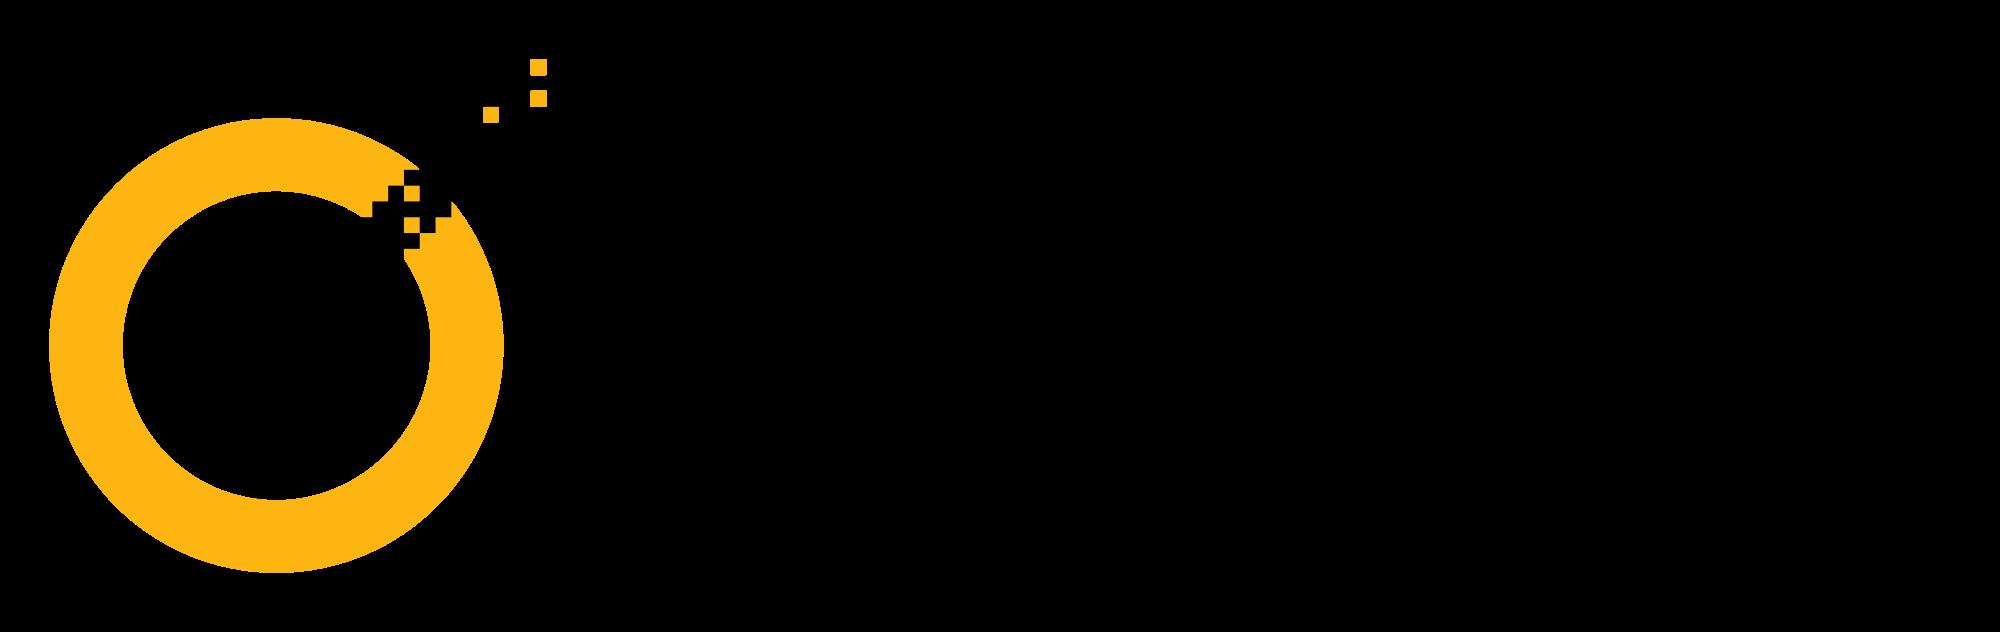 2000px-Symantec_logo10.png